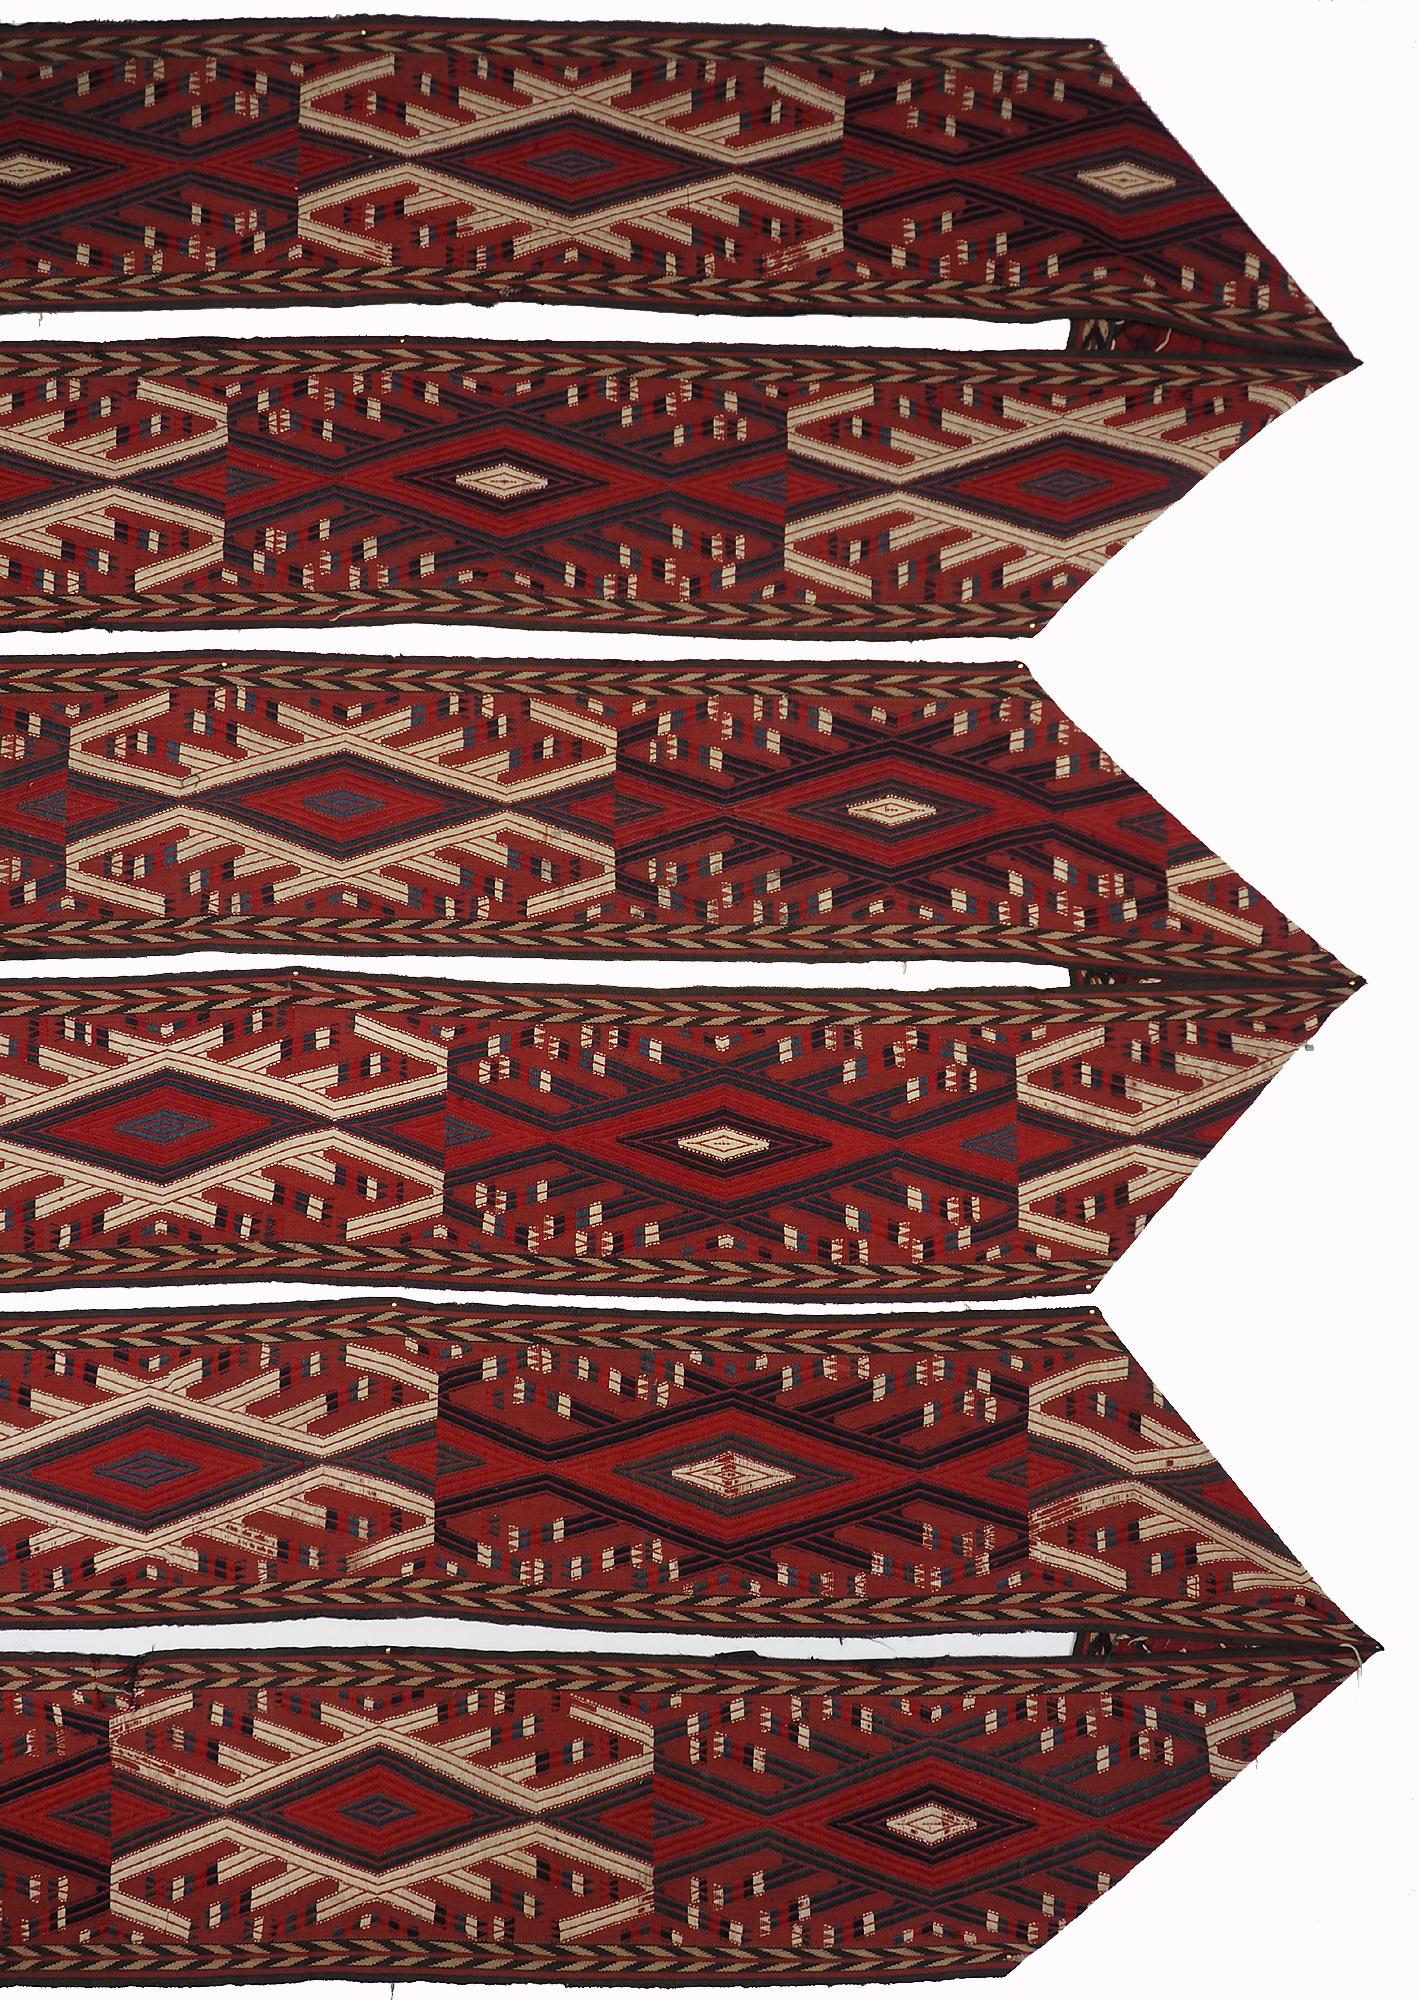 16 m x35 cm nomaden Turkmen Buchara Jomud Kelim Zeltband 19jh HH